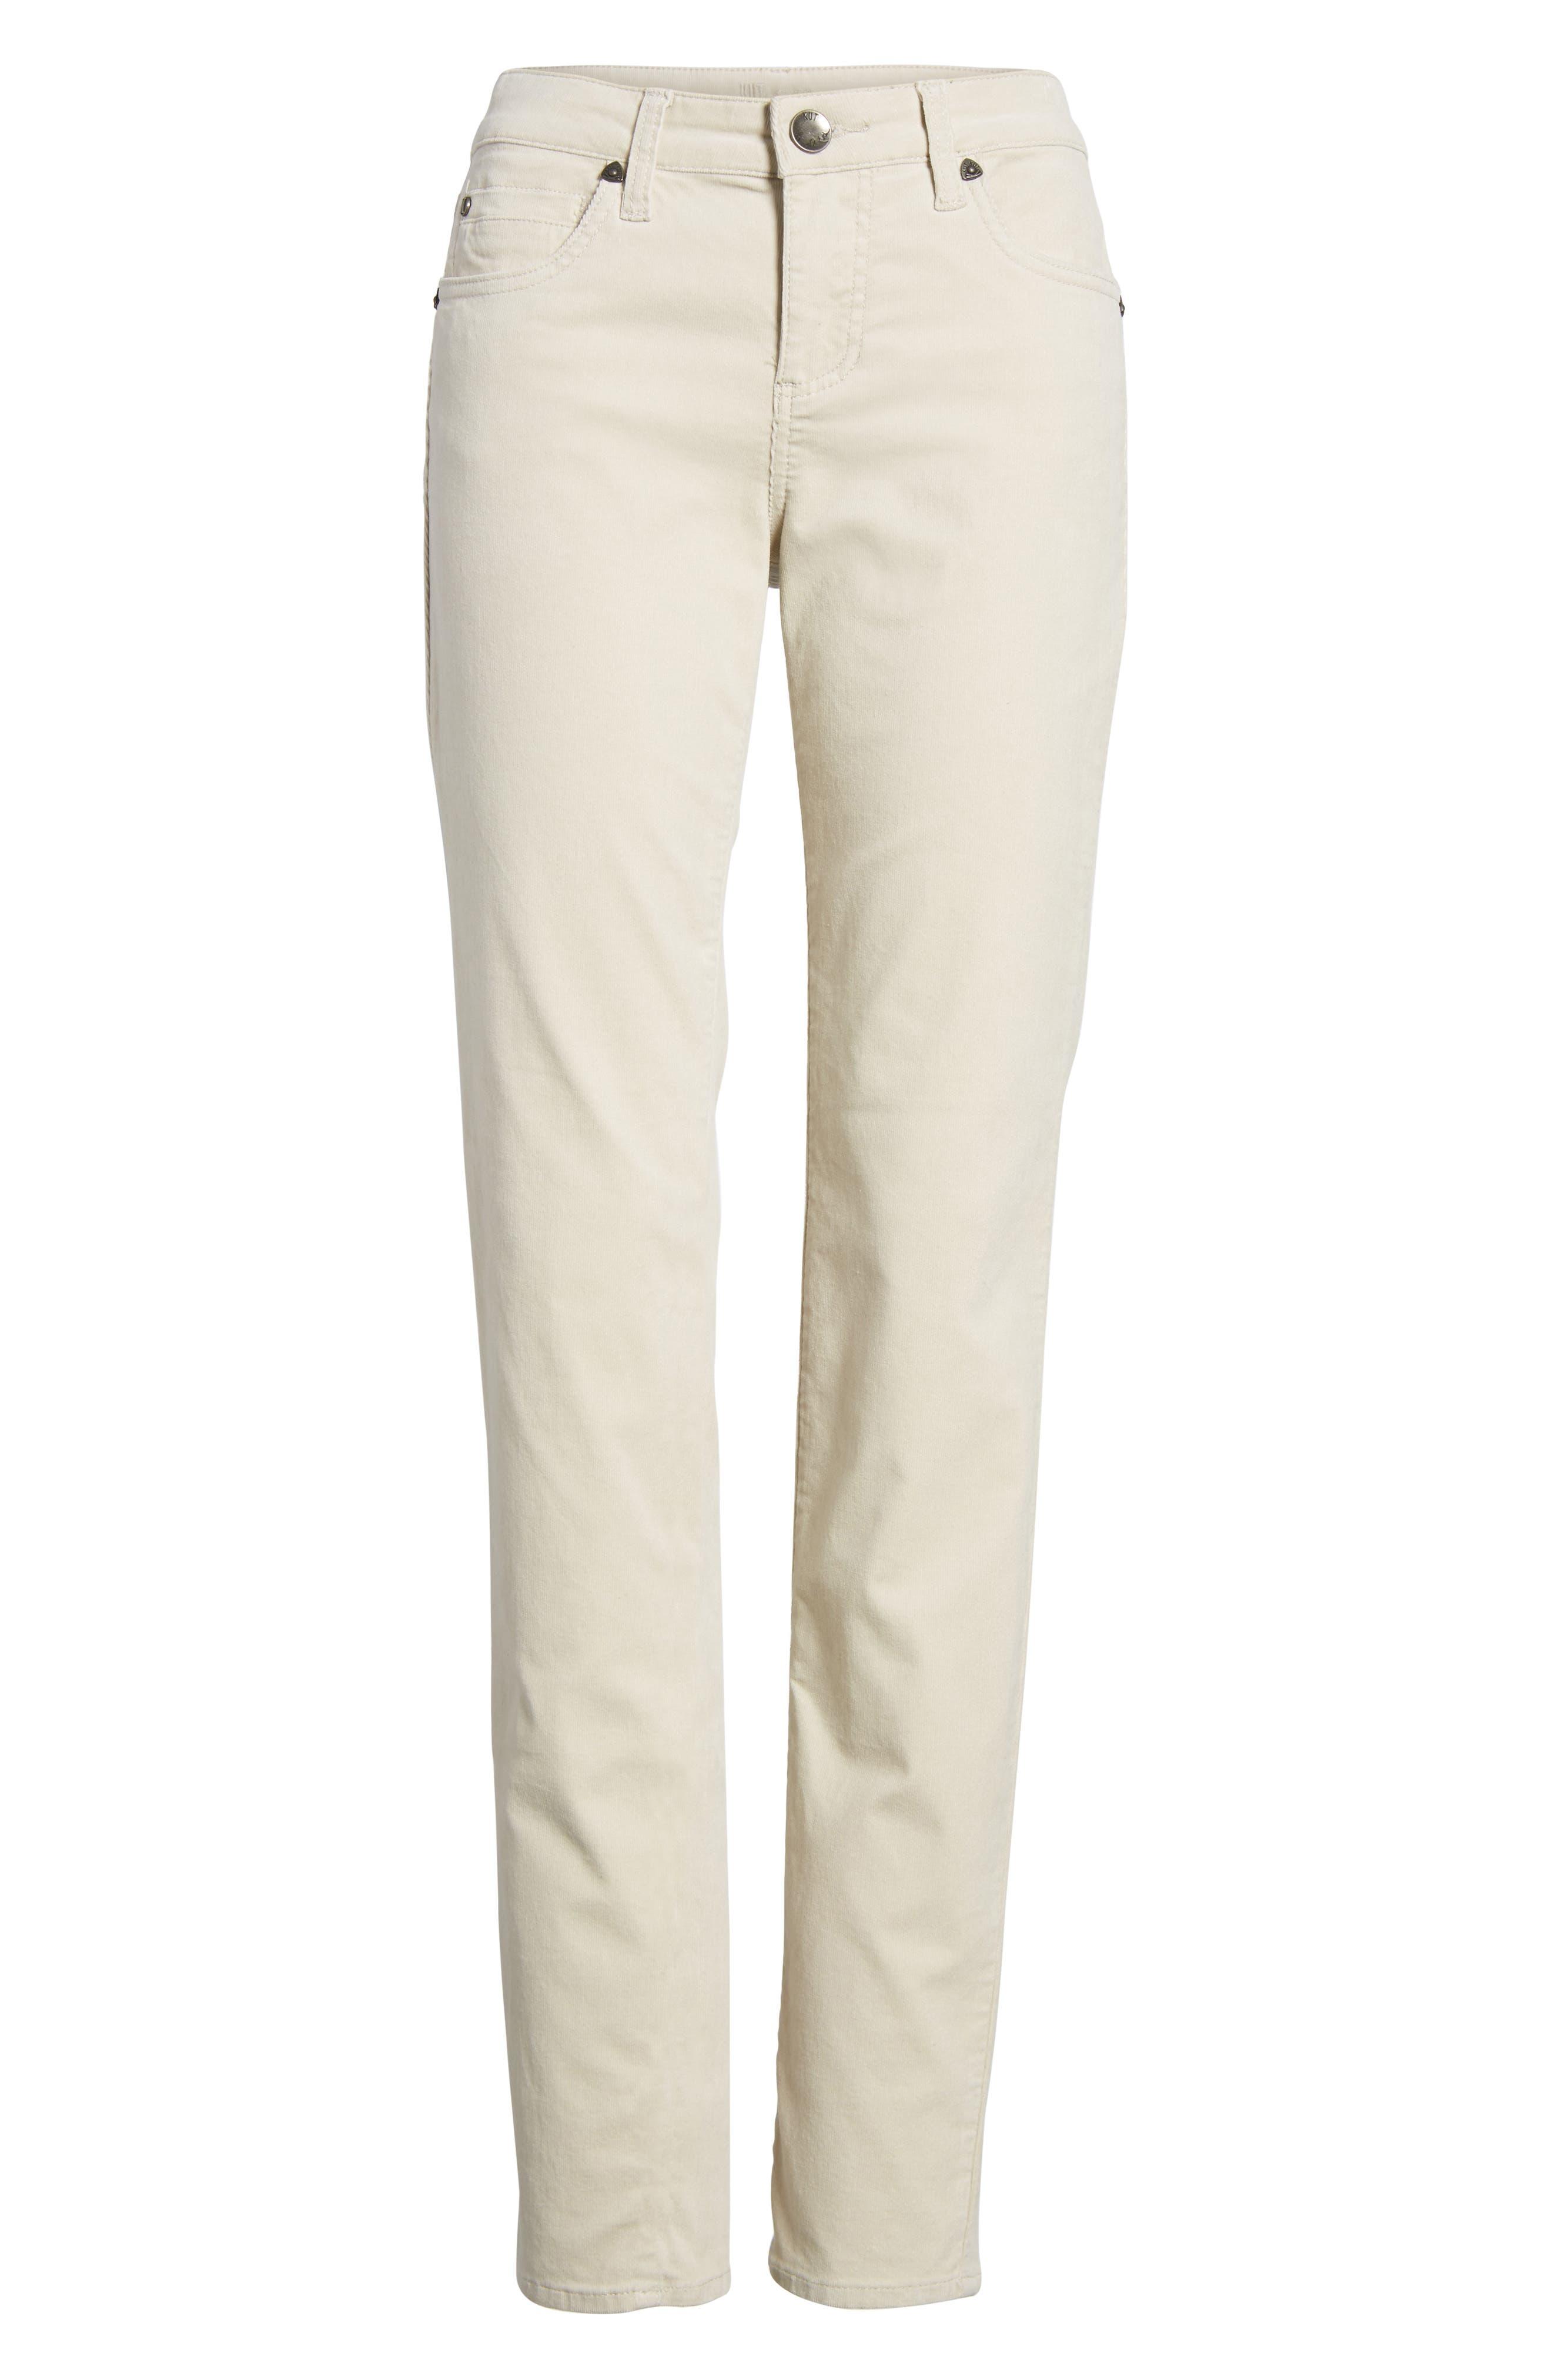 'Diana' Stretch Corduroy Skinny Pants,                             Alternate thumbnail 262, color,